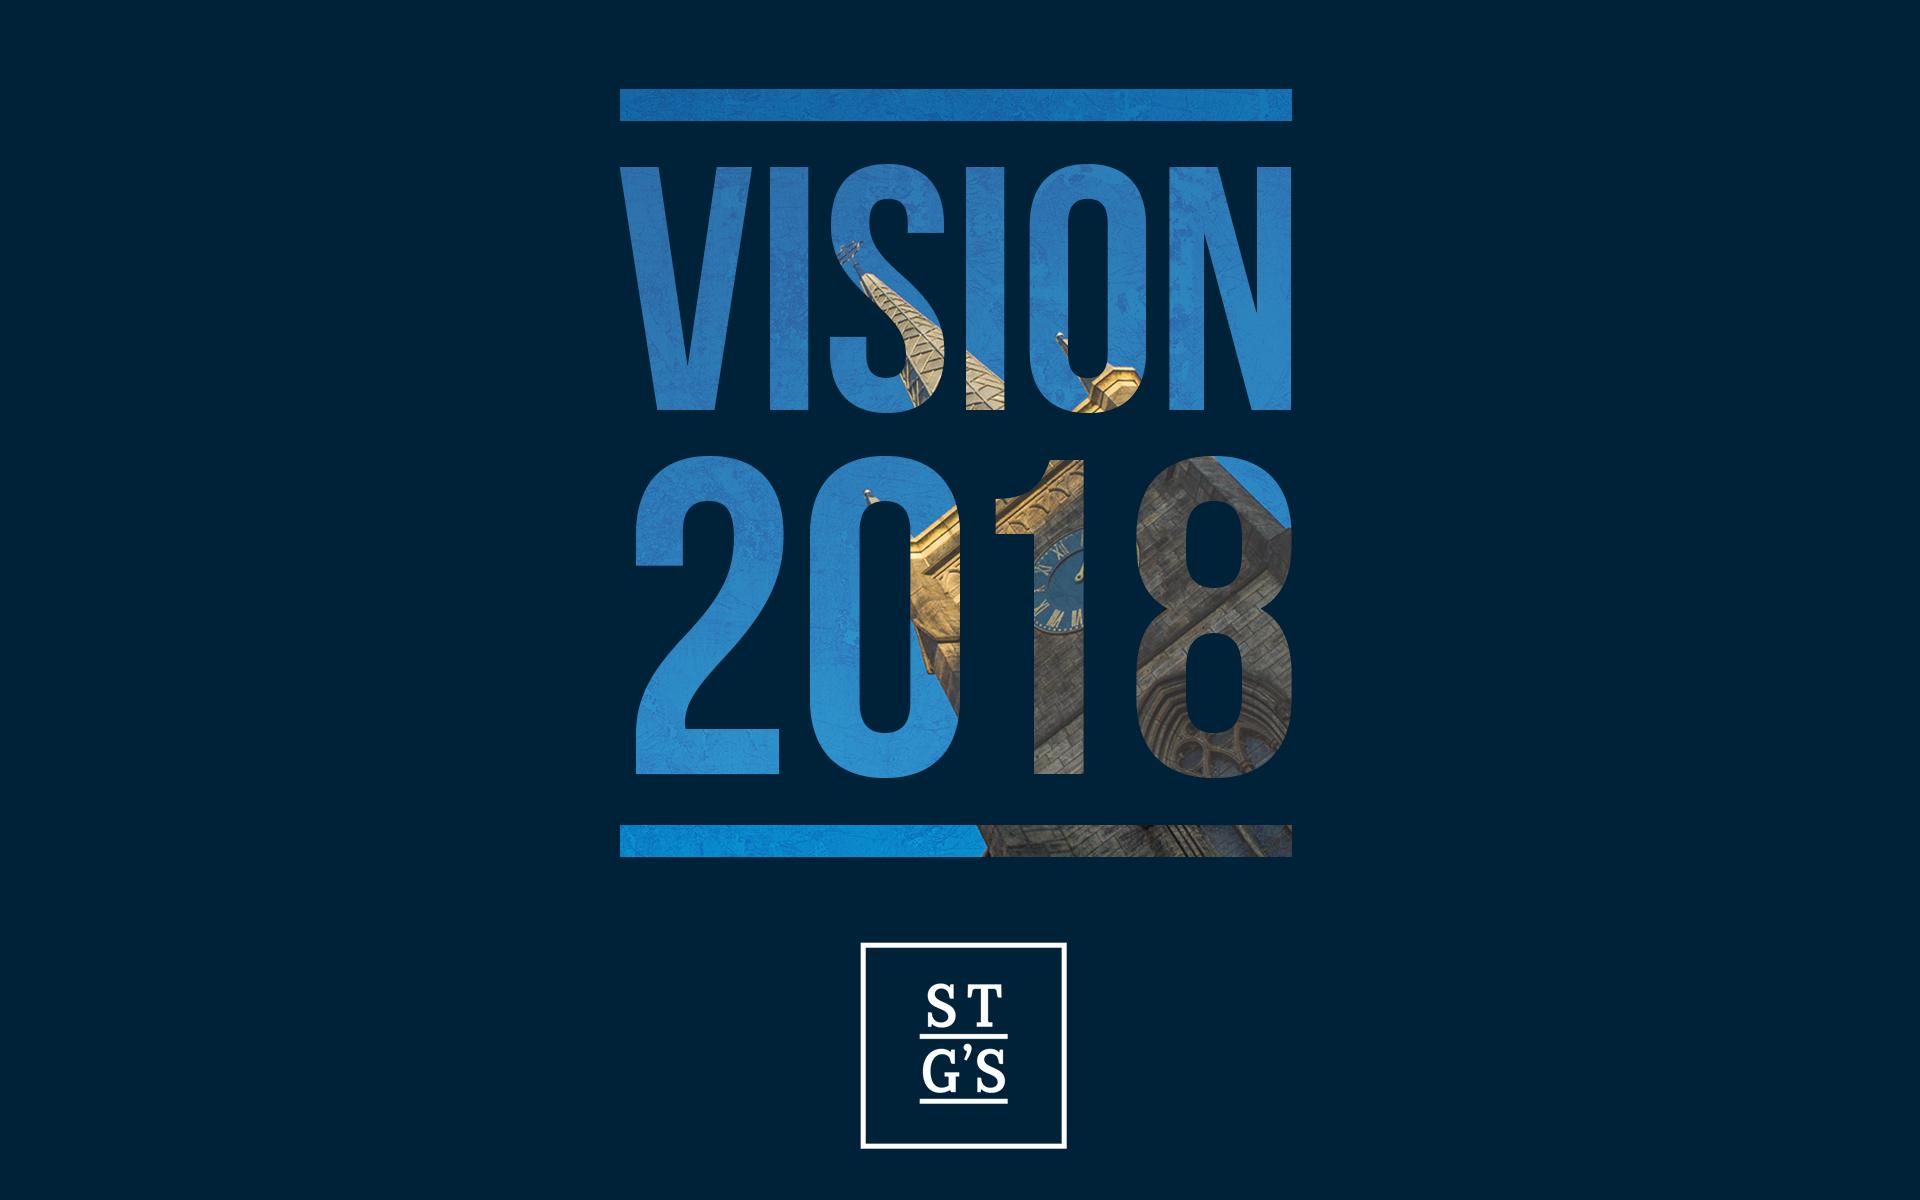 Vision 2018 Image.jpg